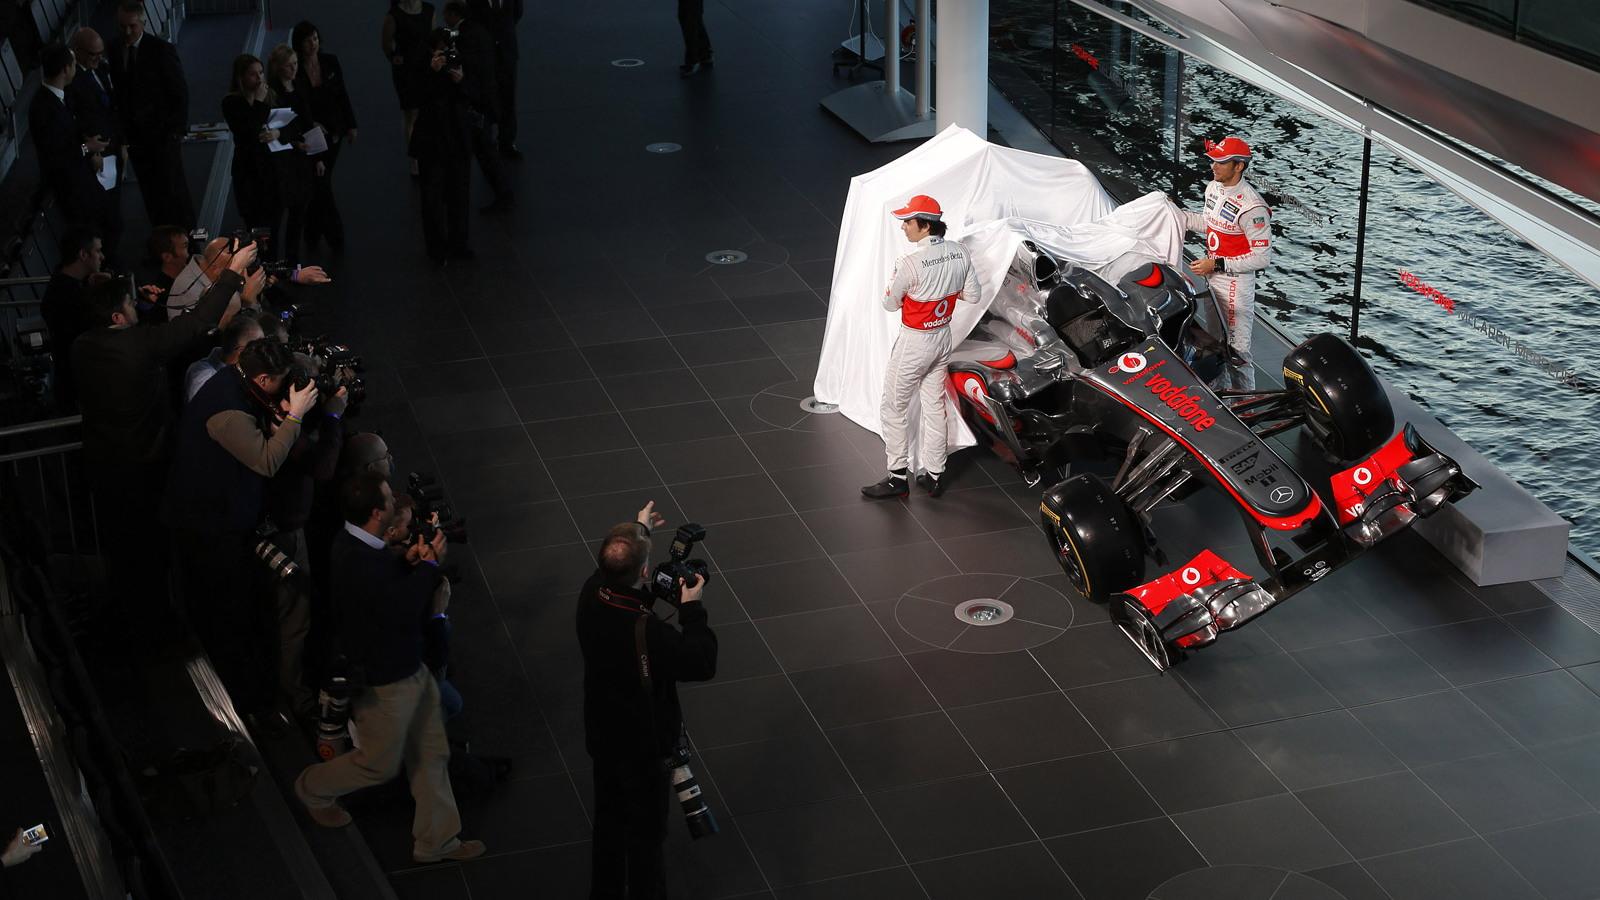 McLaren MP4-28 2013 Formula One race car